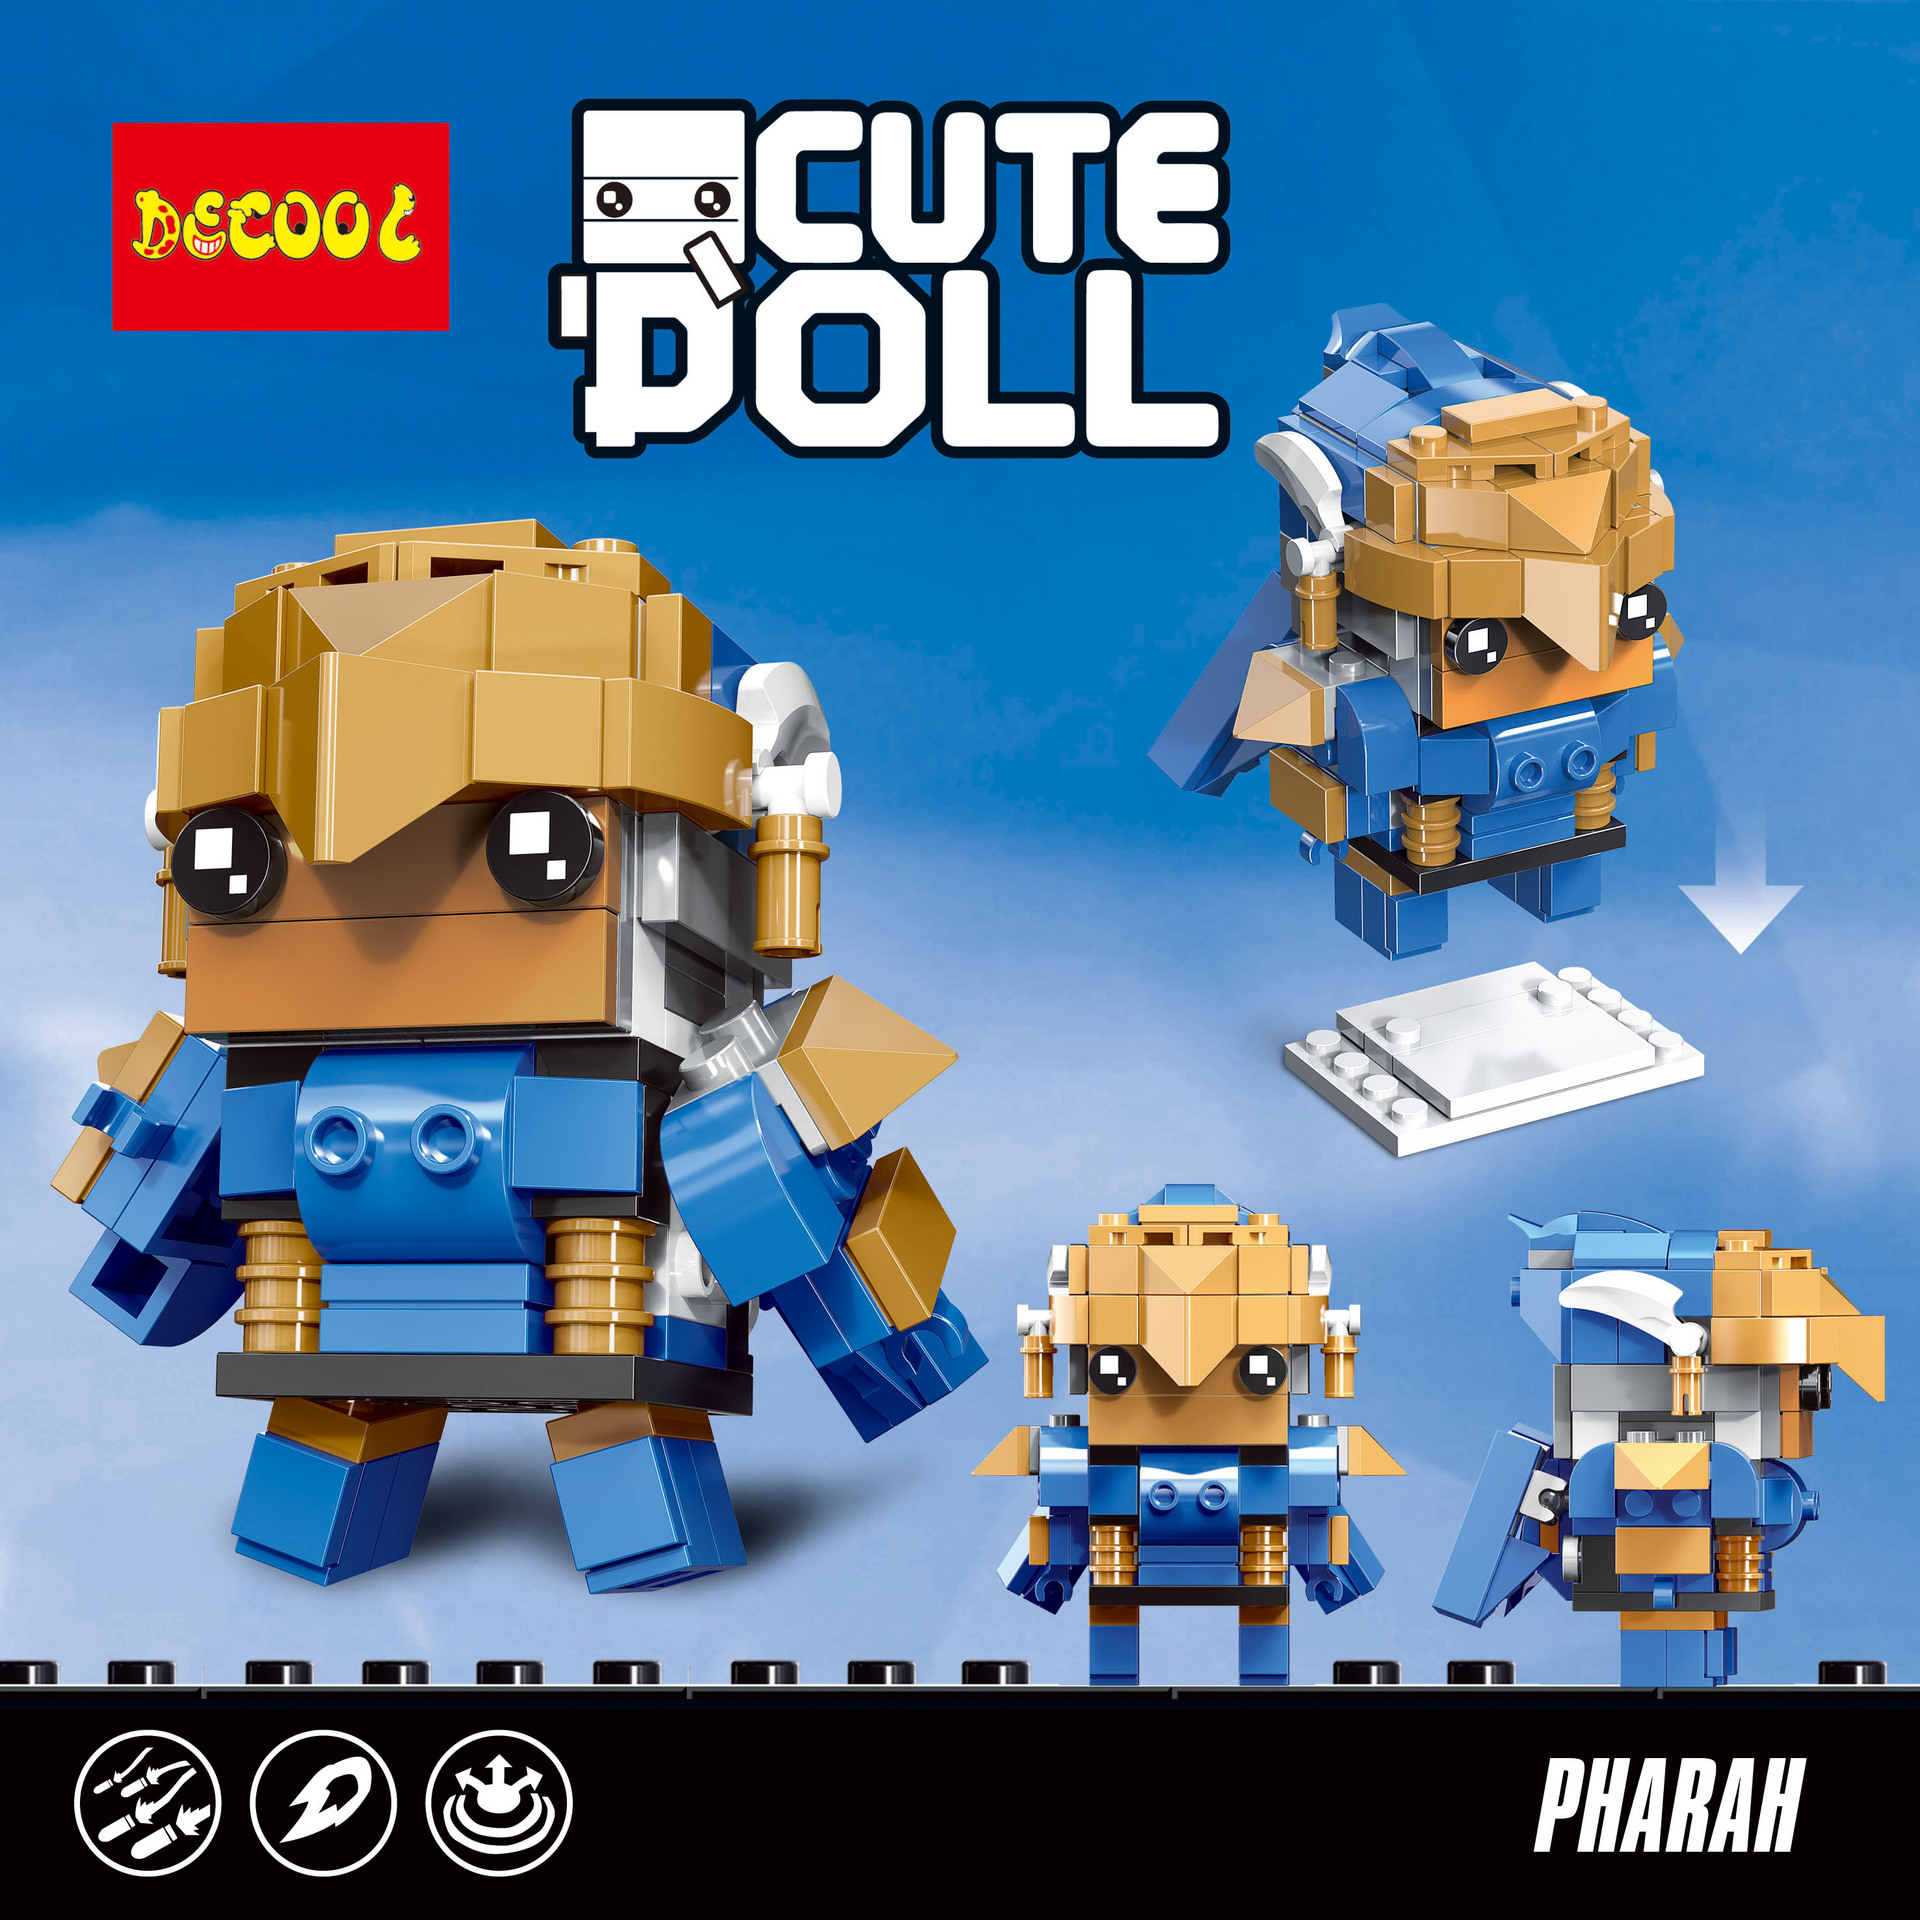 DECOOL 6849 Overwatch square head boy: Pharaoh's Eagle Emalie CuteDoll: PHARAH